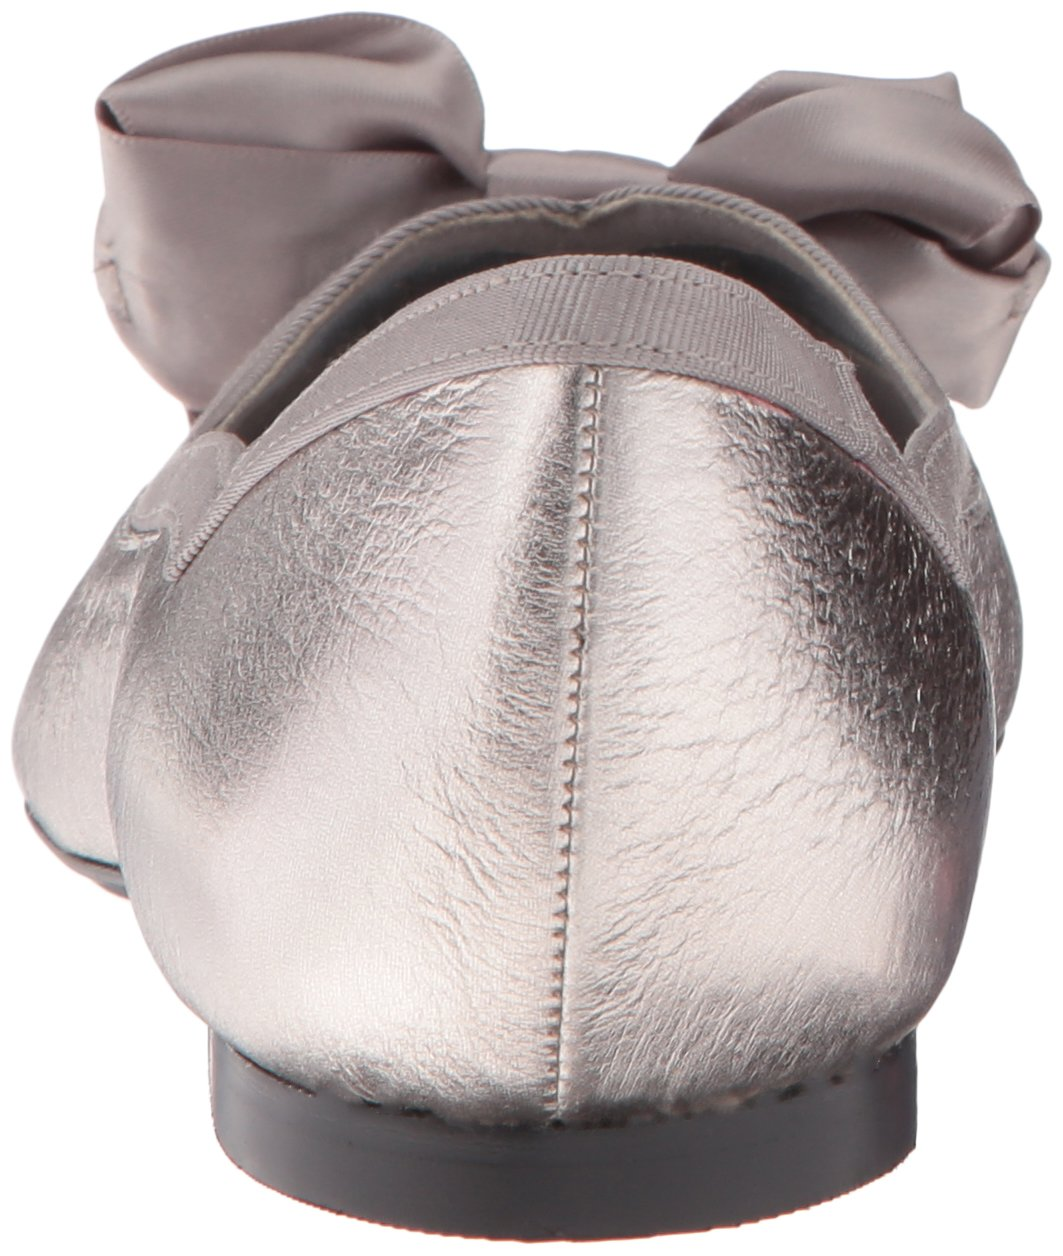 J.Renee Women's Allitson Pointed Toe Flat B01INJP8N8 9.5 B(M) US|Taupe